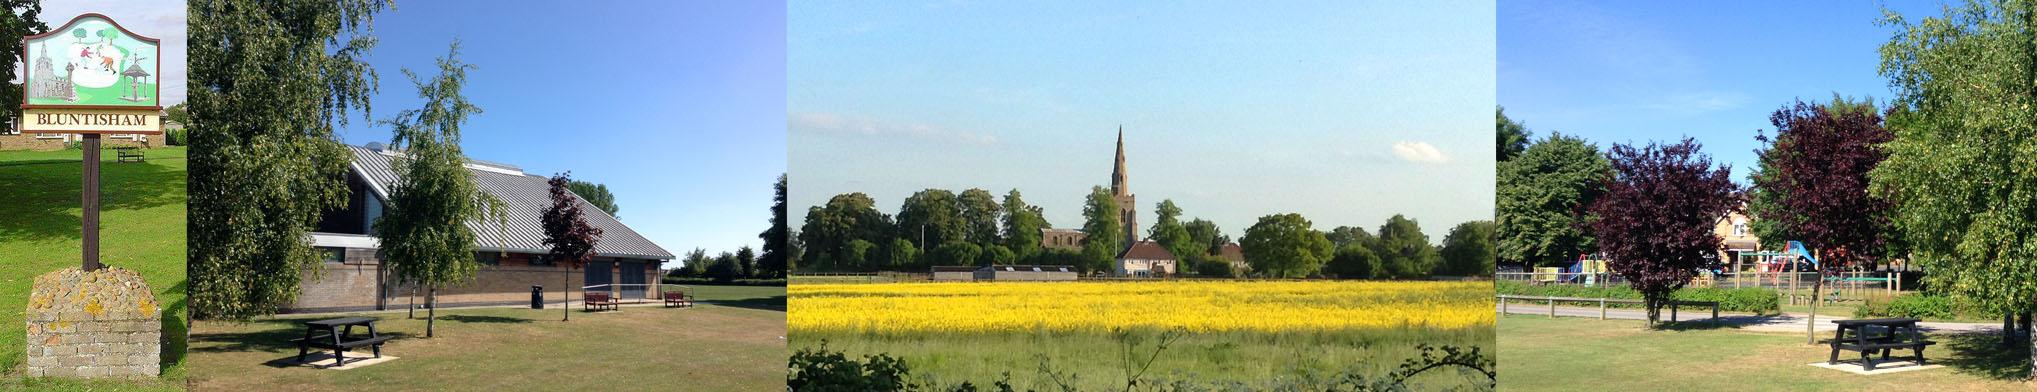 Views of Bluntisham